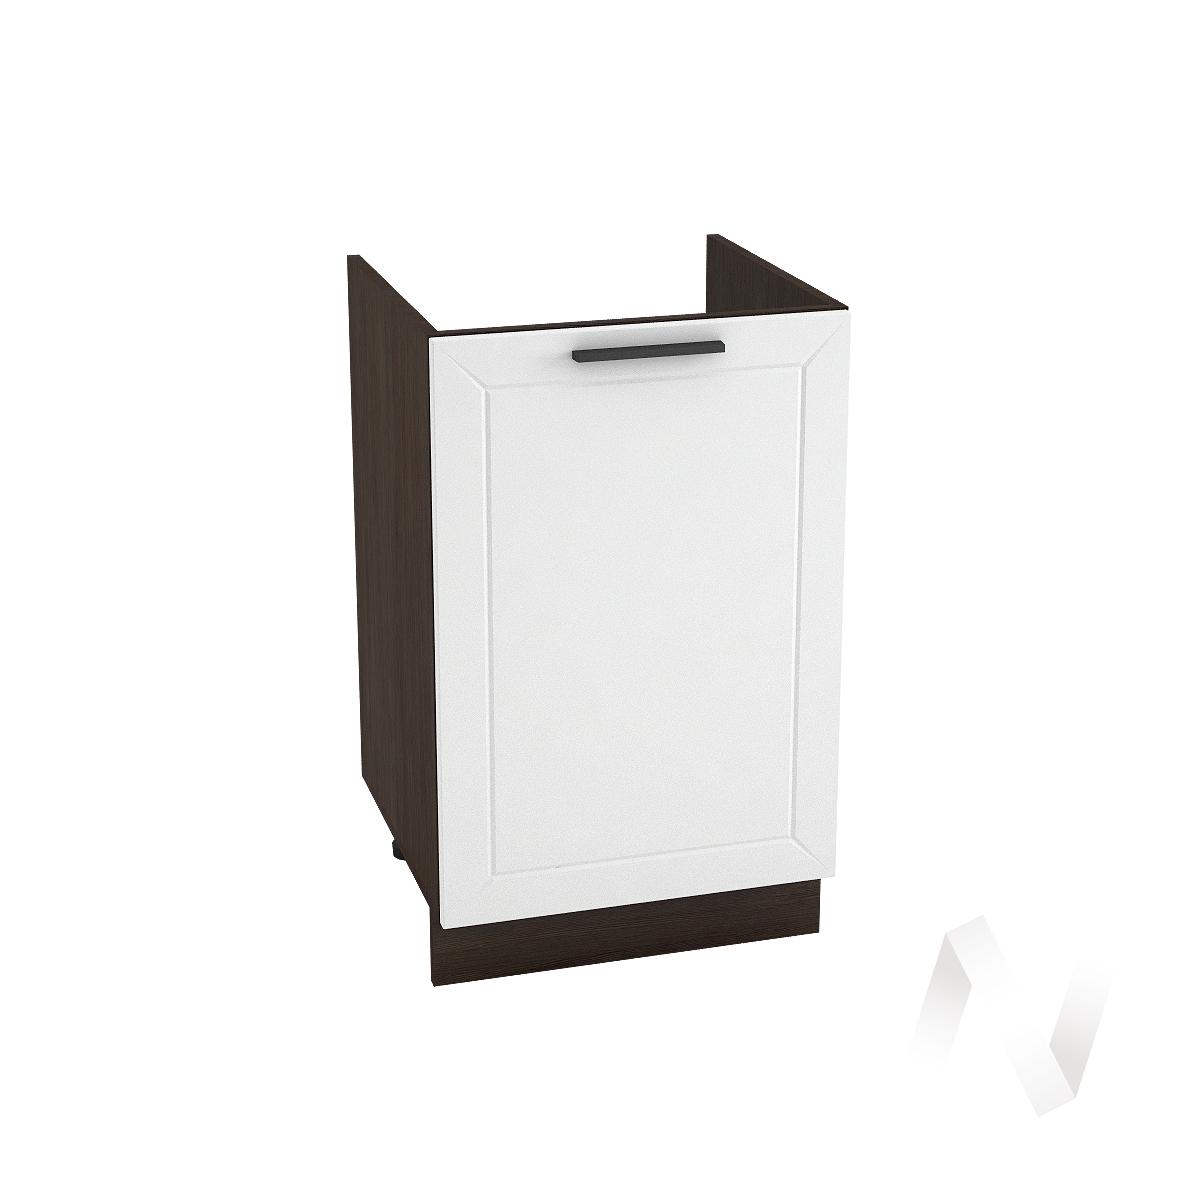 "Кухня ""Глетчер"": Шкаф нижний под мойку 500, ШНМ 500 (Айленд Силк/корпус венге)"